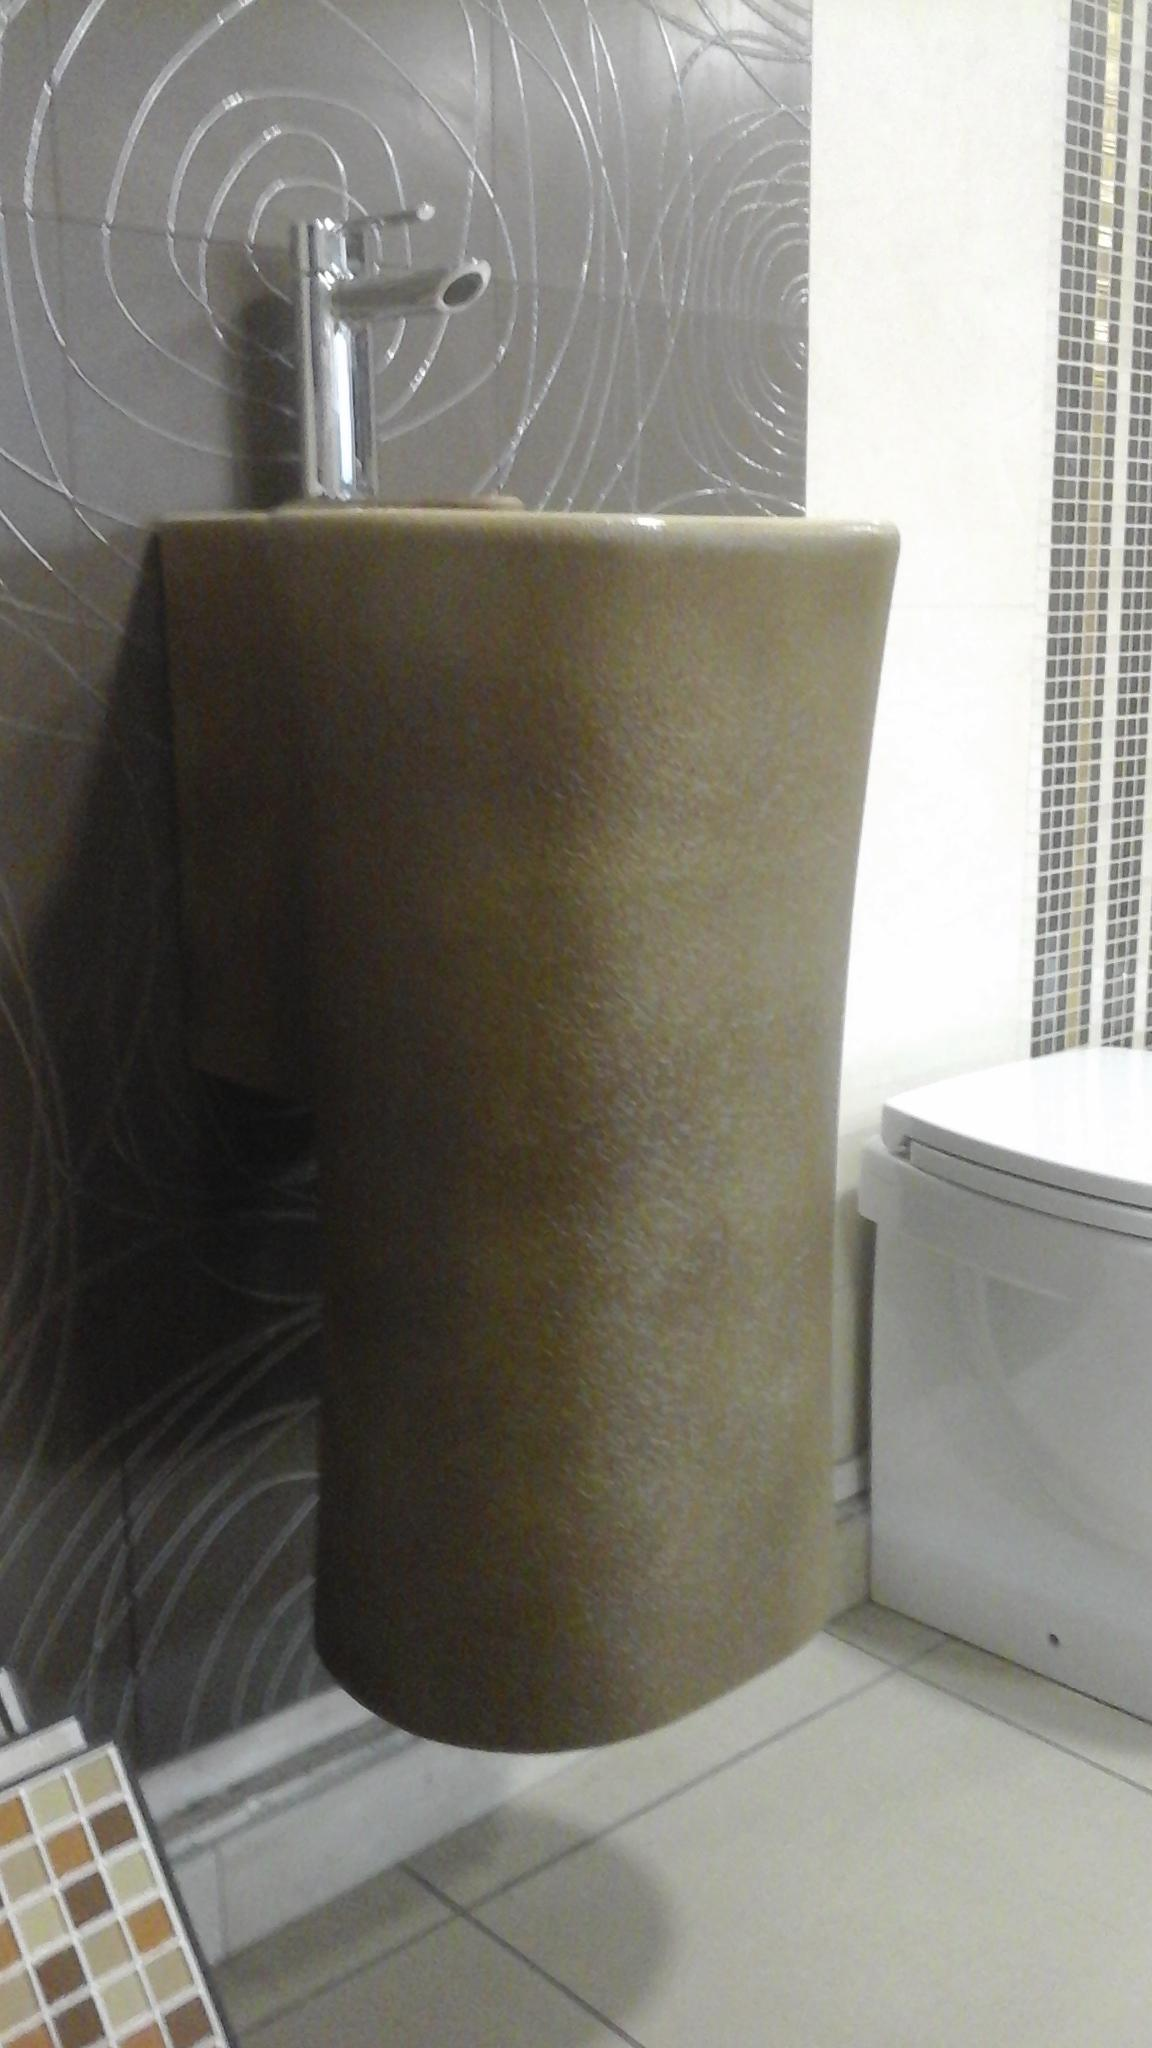 Lavabo sospeso nativo catania for Altezza lavabo sospeso